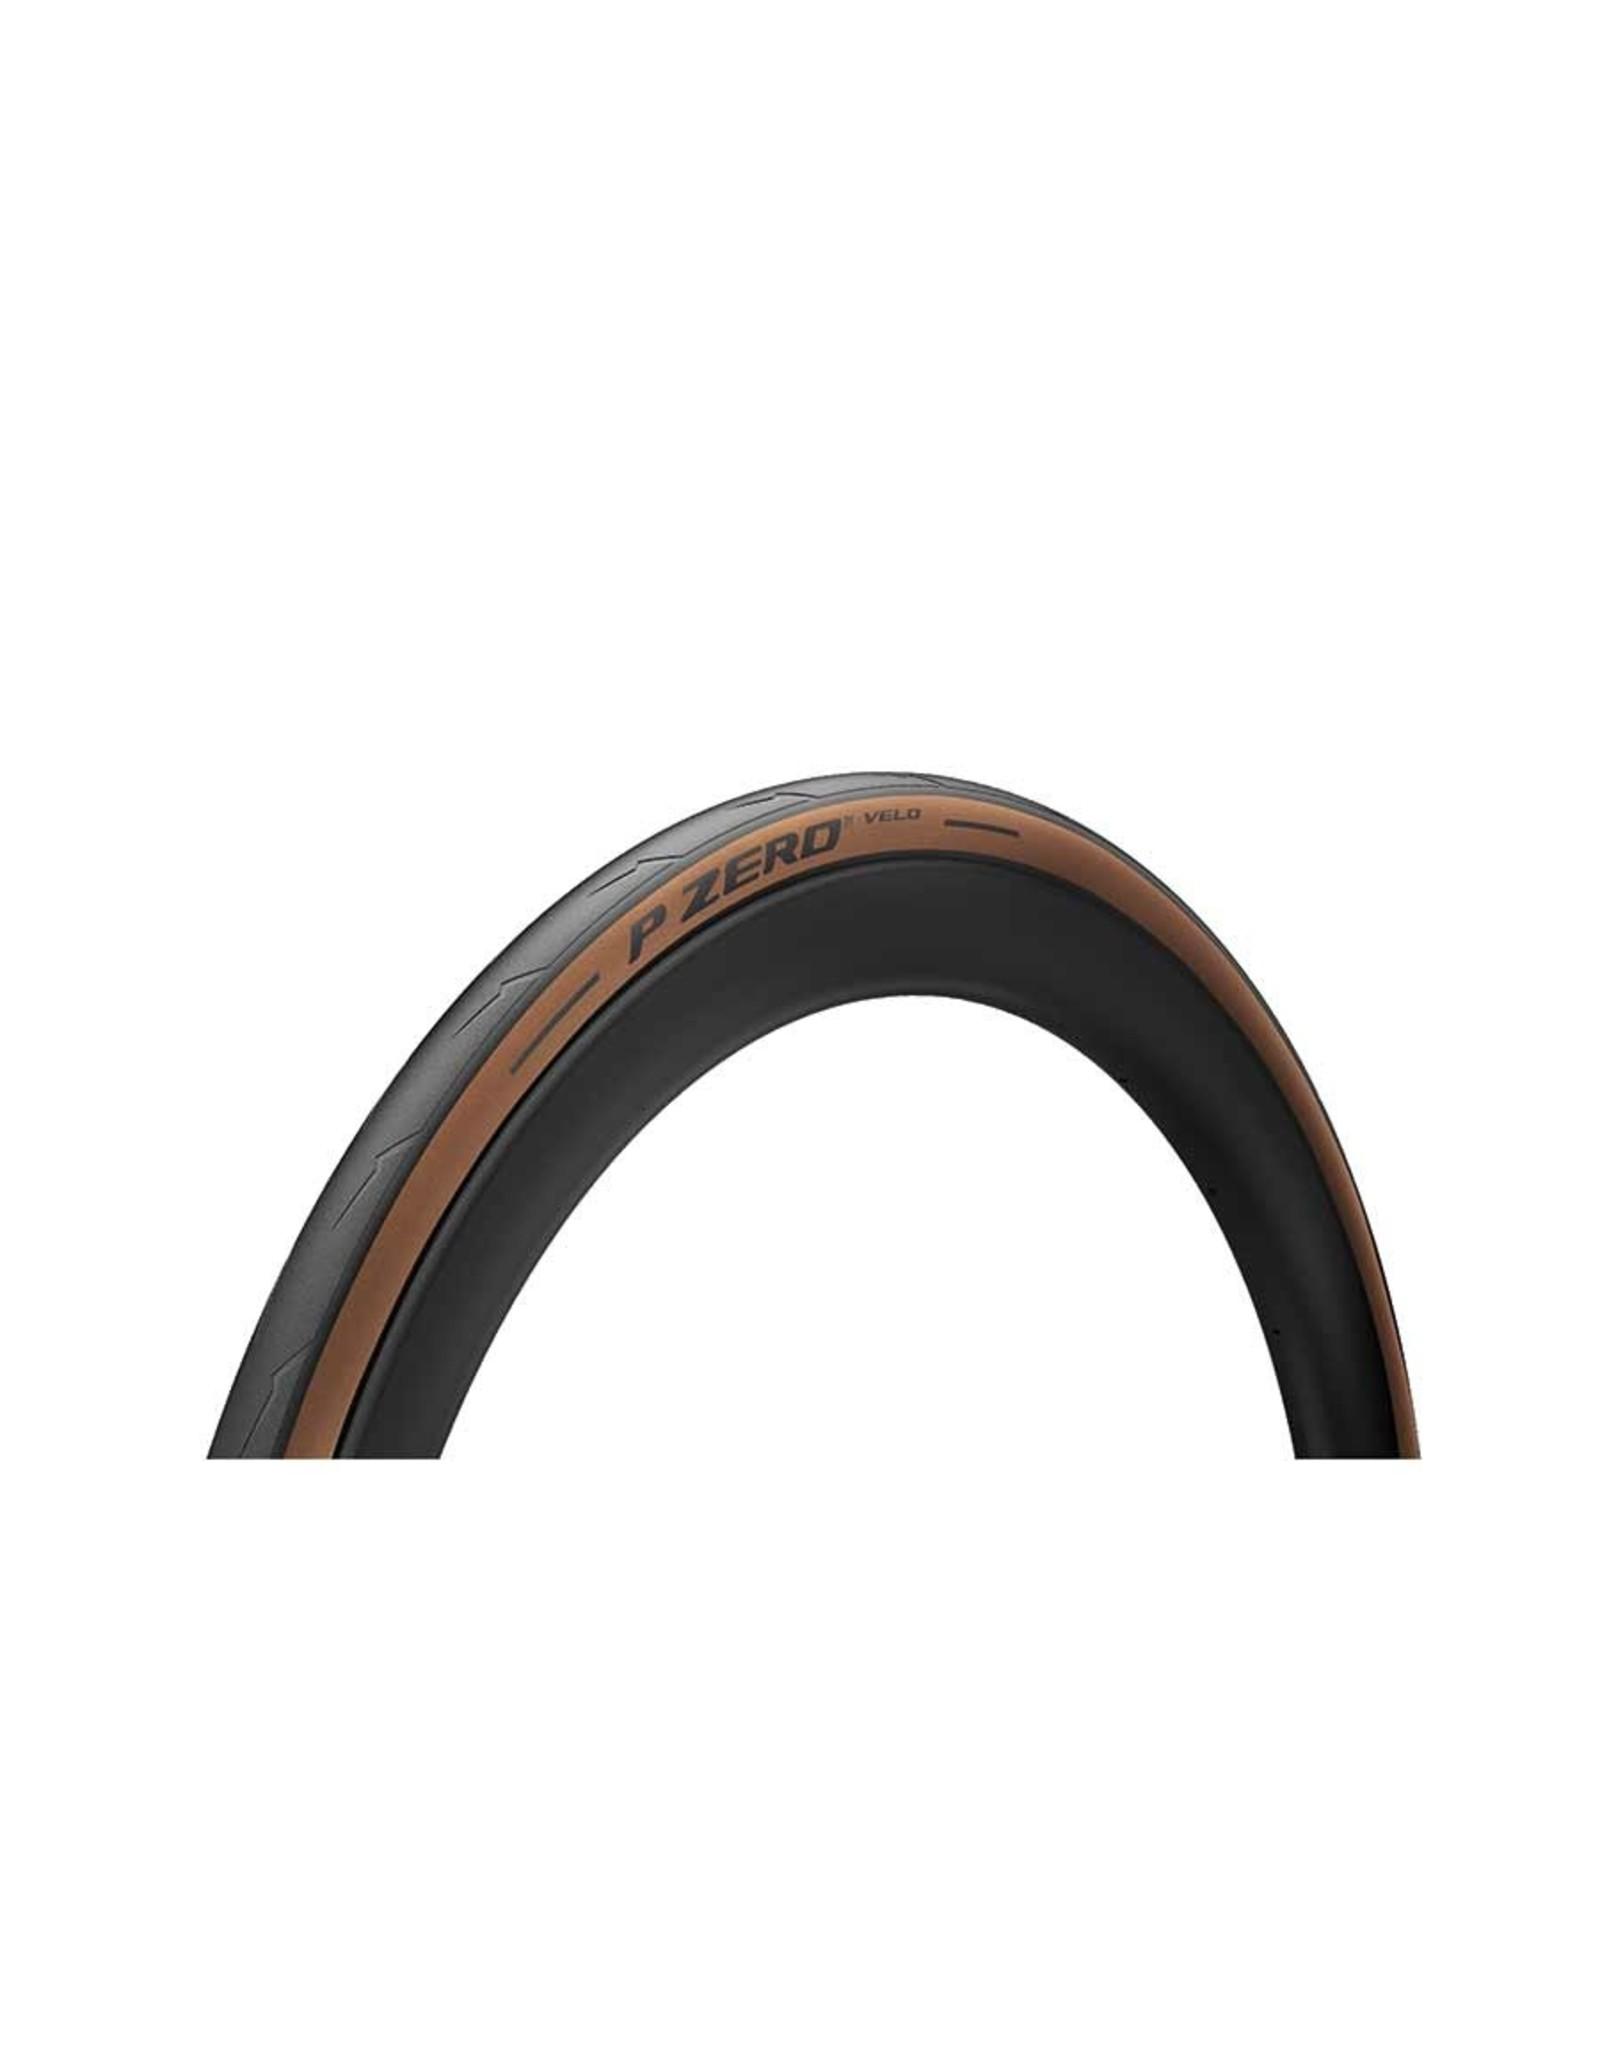 Pirelli Pirelli, PZero Velo, Tire, 700x25C, Folding, Clincher, Smartnet Silica, Aramid Fiber, 127TPI, Beige